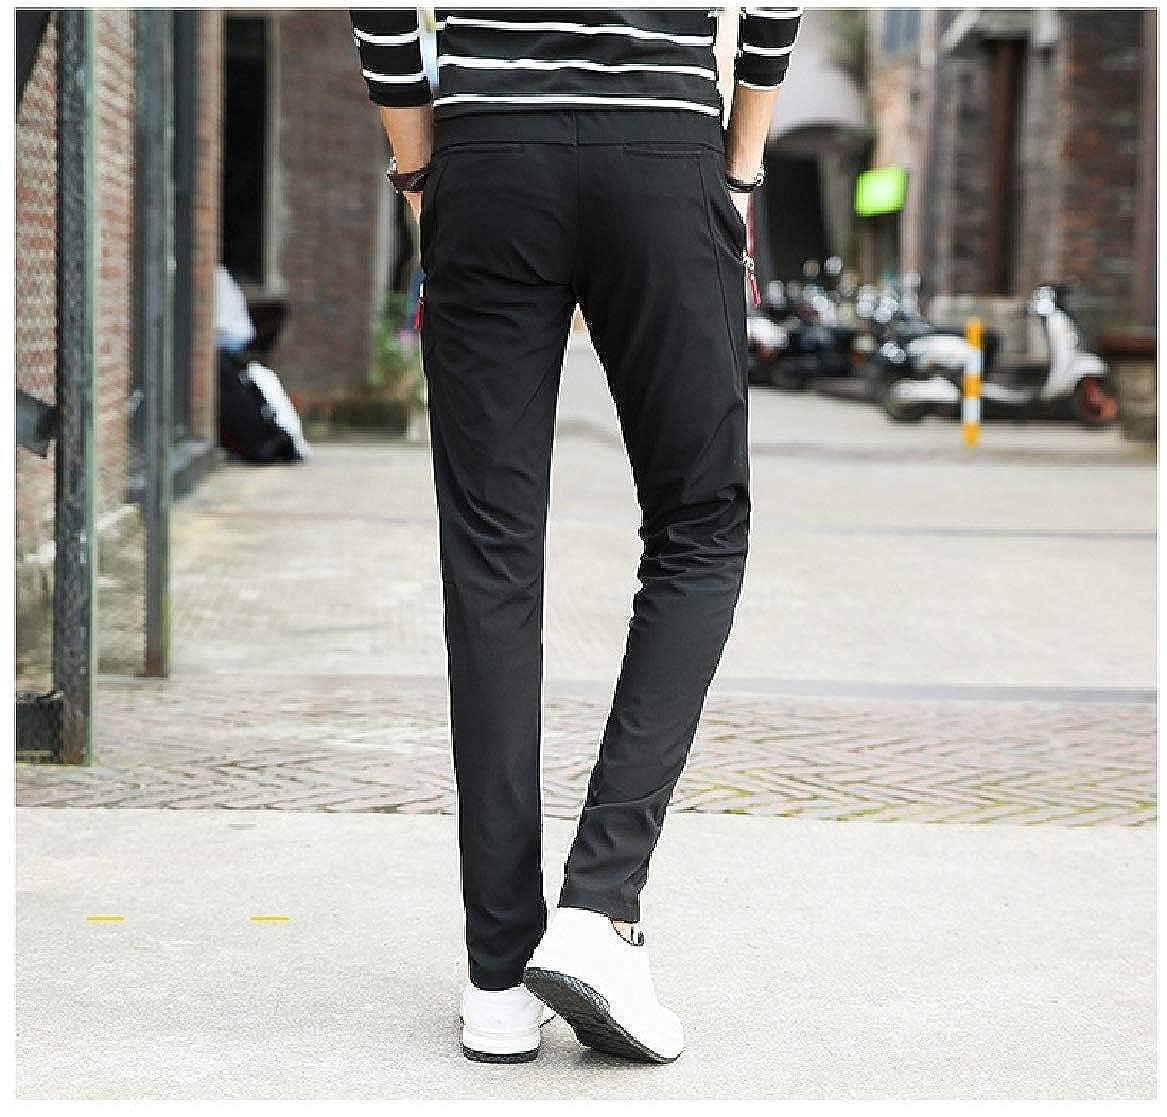 Abetteric Mens Solid Color Plus Size Stretch Silm Fit Big Pockets Work Pant Black 4XL